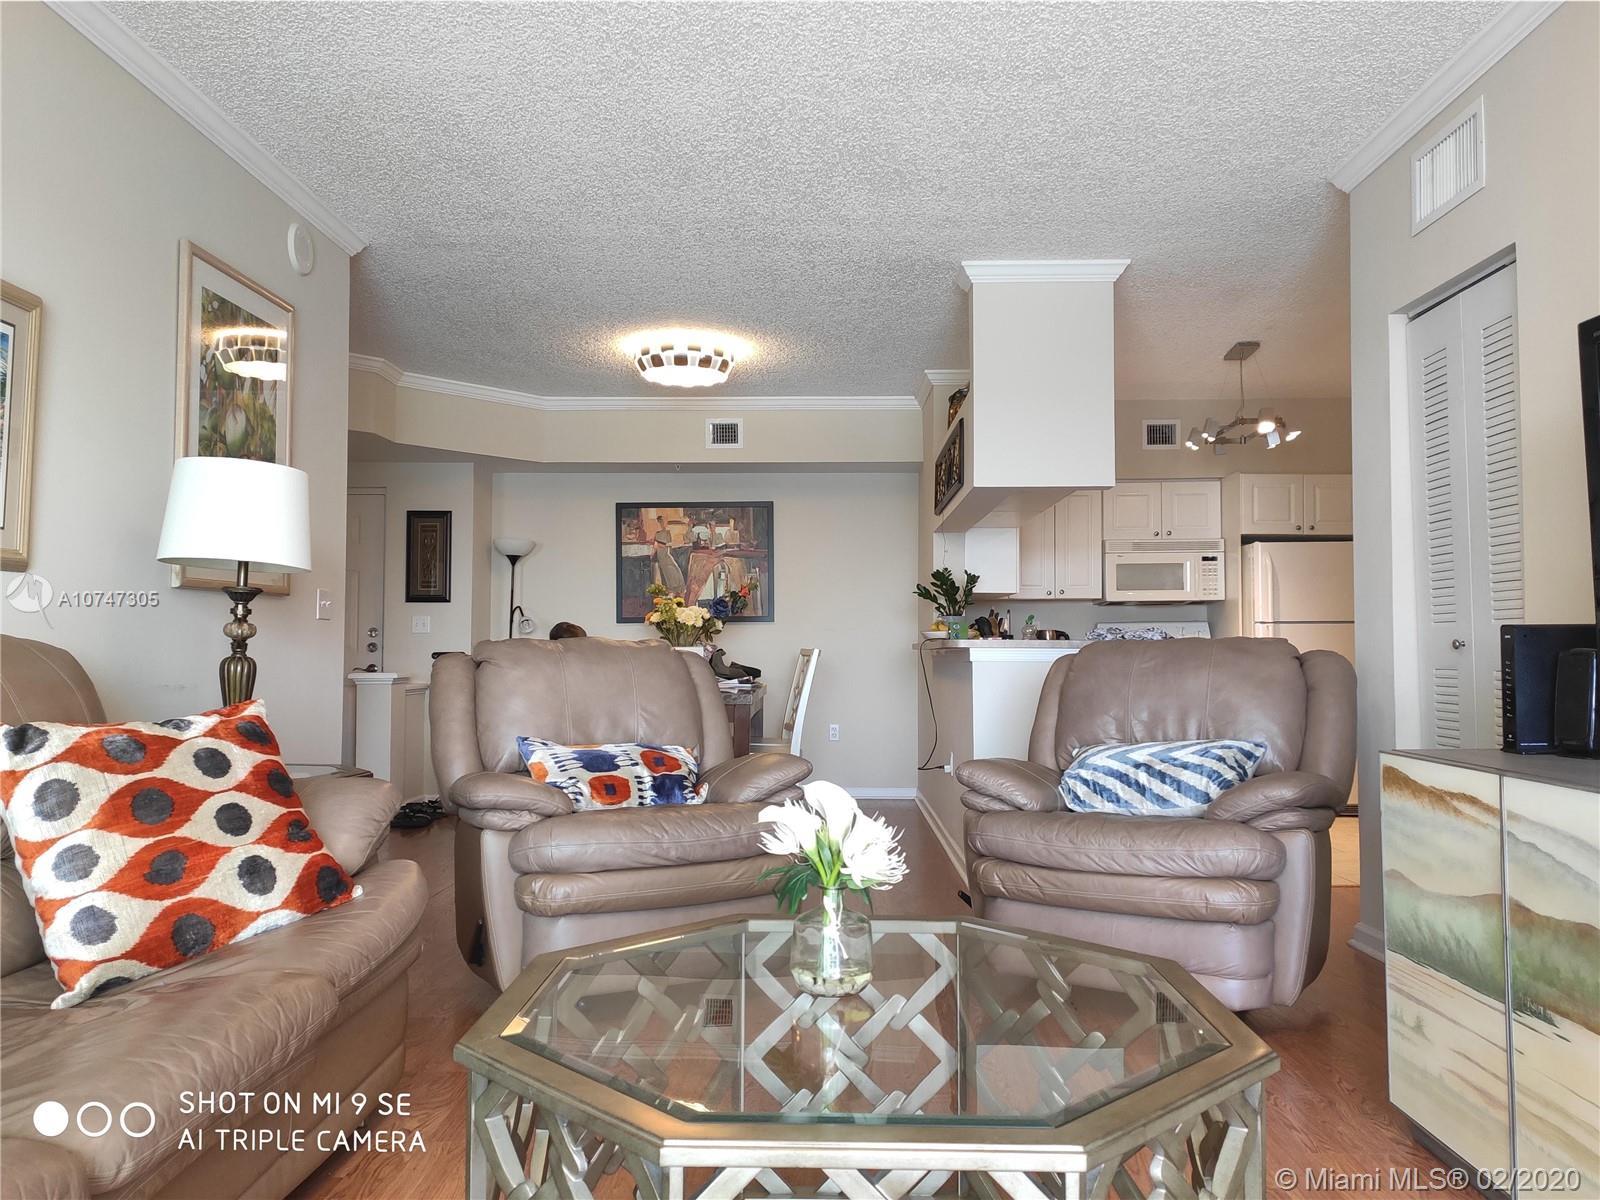 Homes for Sale in Zip Code 33313